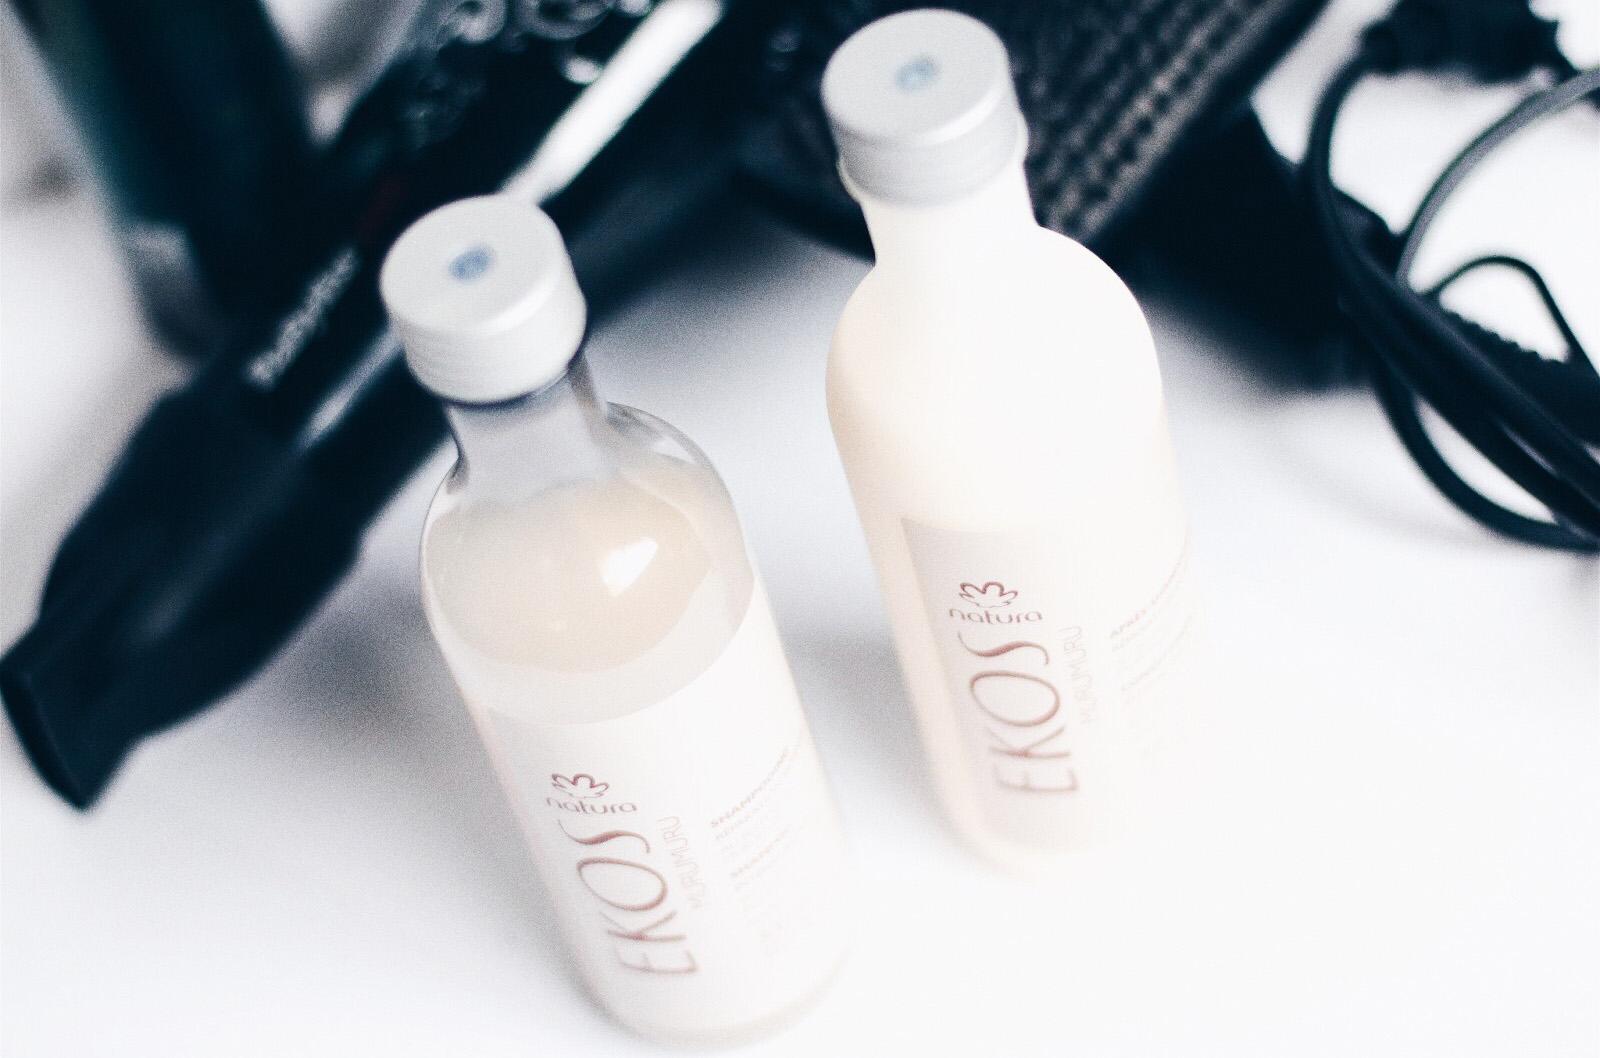 natura brasil ekos murumuru shampooing après shampooing avis test